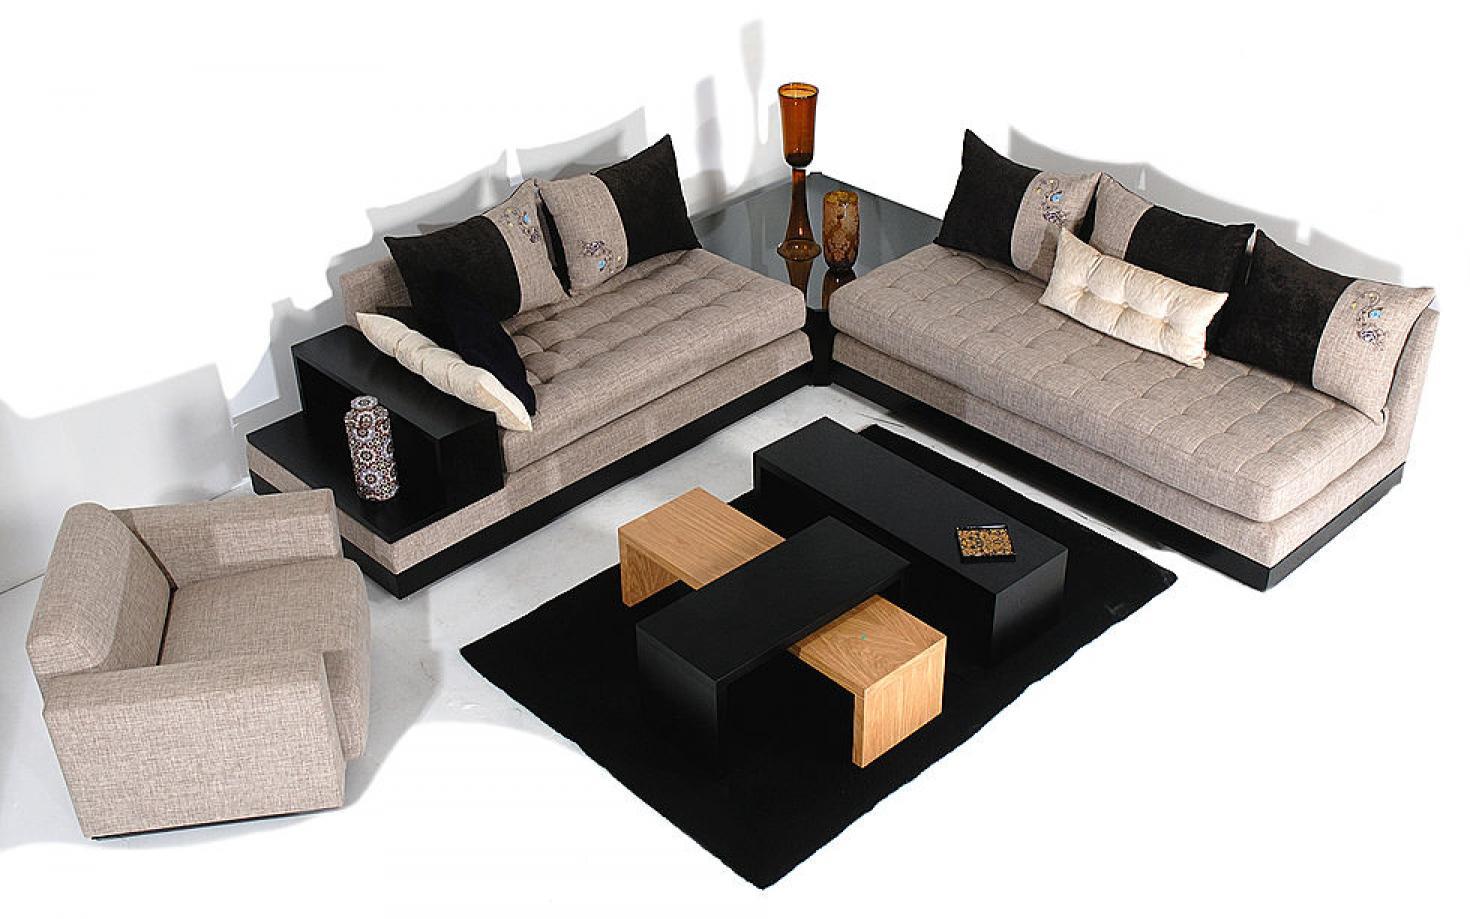 Salon Canapé Moderne Marocain 2017 : Canapé moderne de salon marocain et fauteuil décor